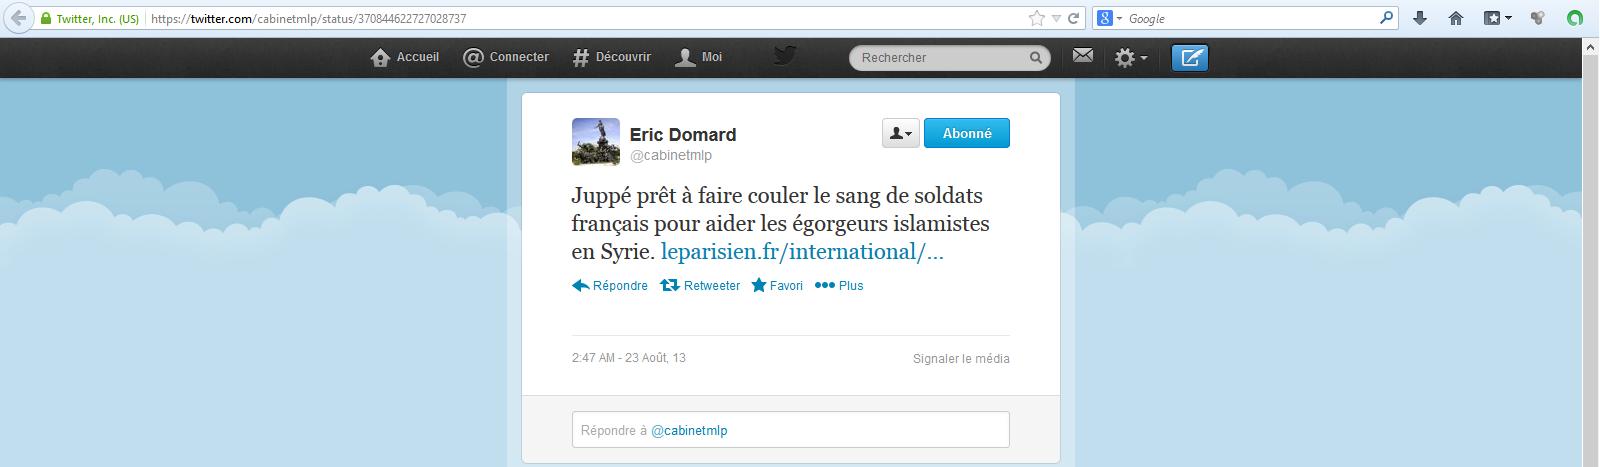 Eric-Domard-les-egorgeurs_islamistes